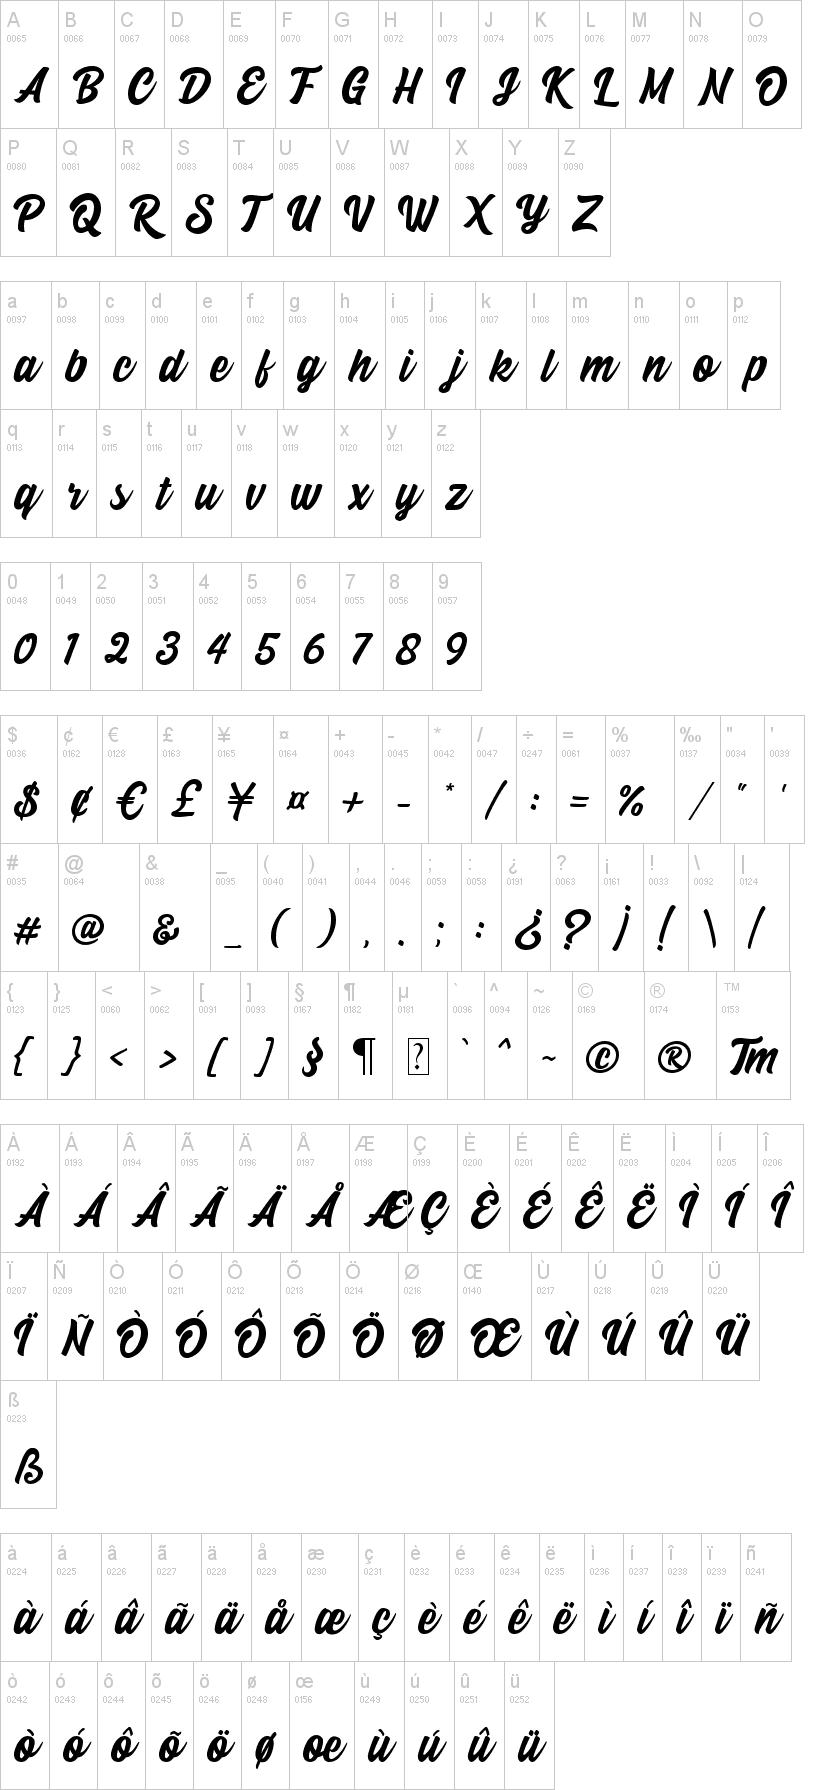 Beindog Gite Font-1